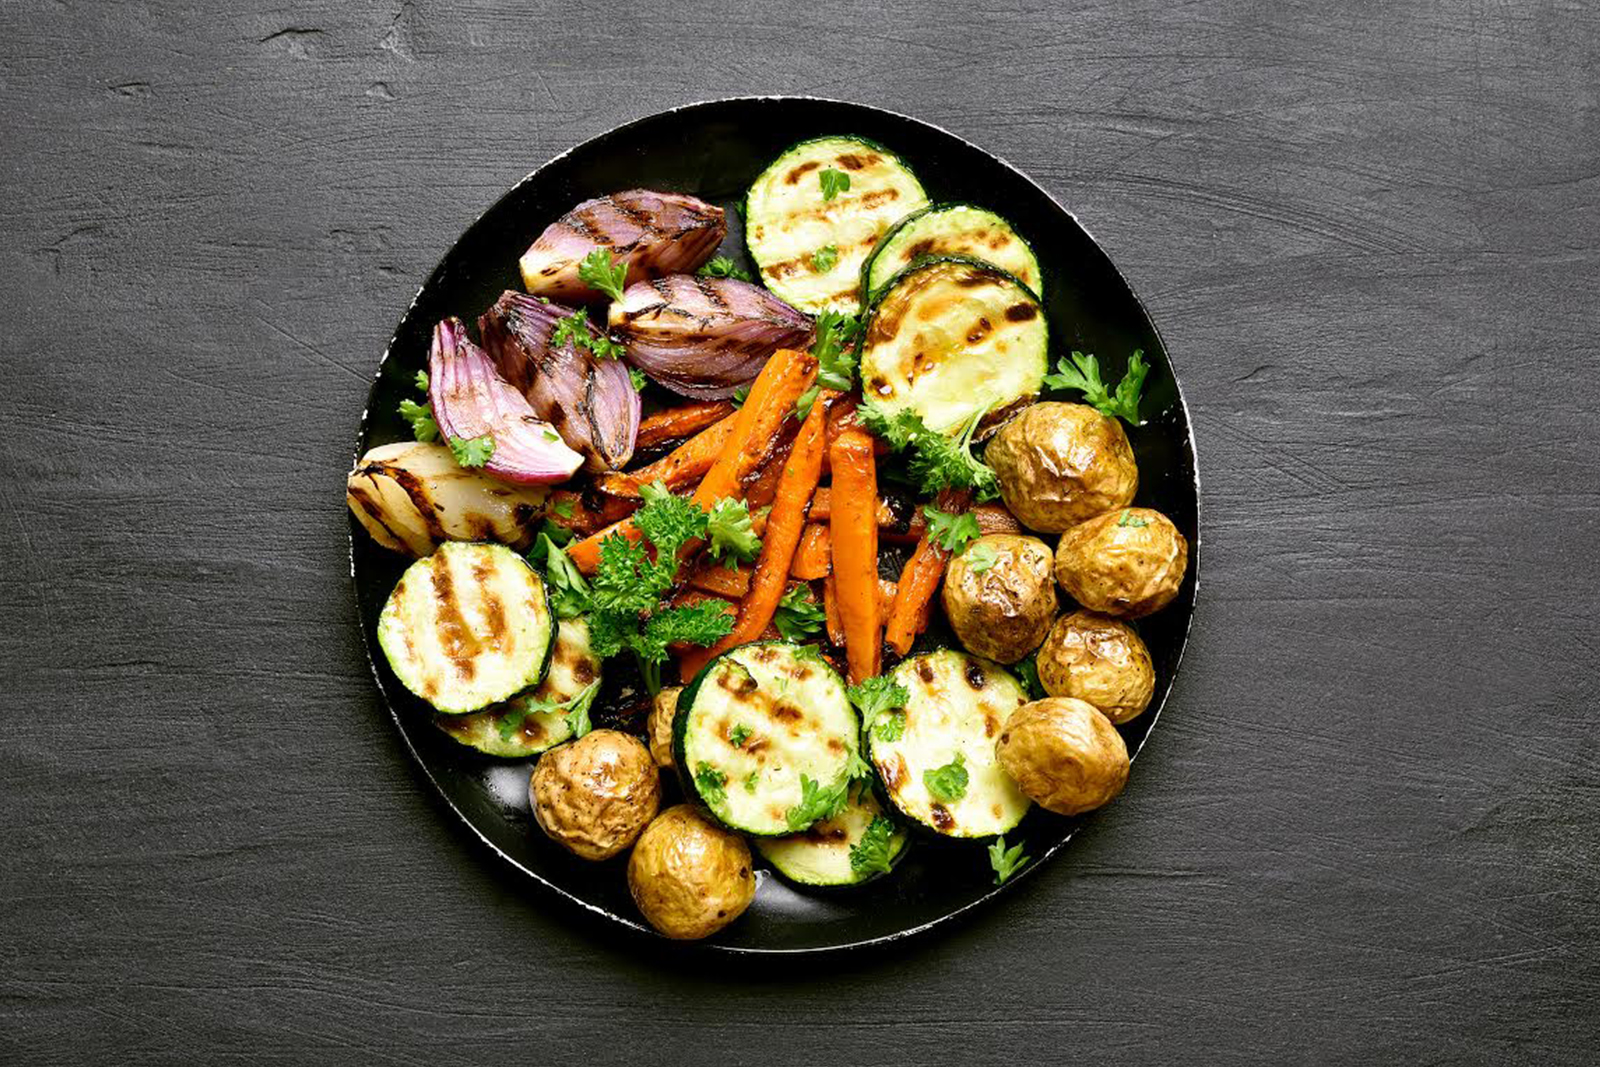 RECIPES: Vegan-ize Your Memorial Day BBQ